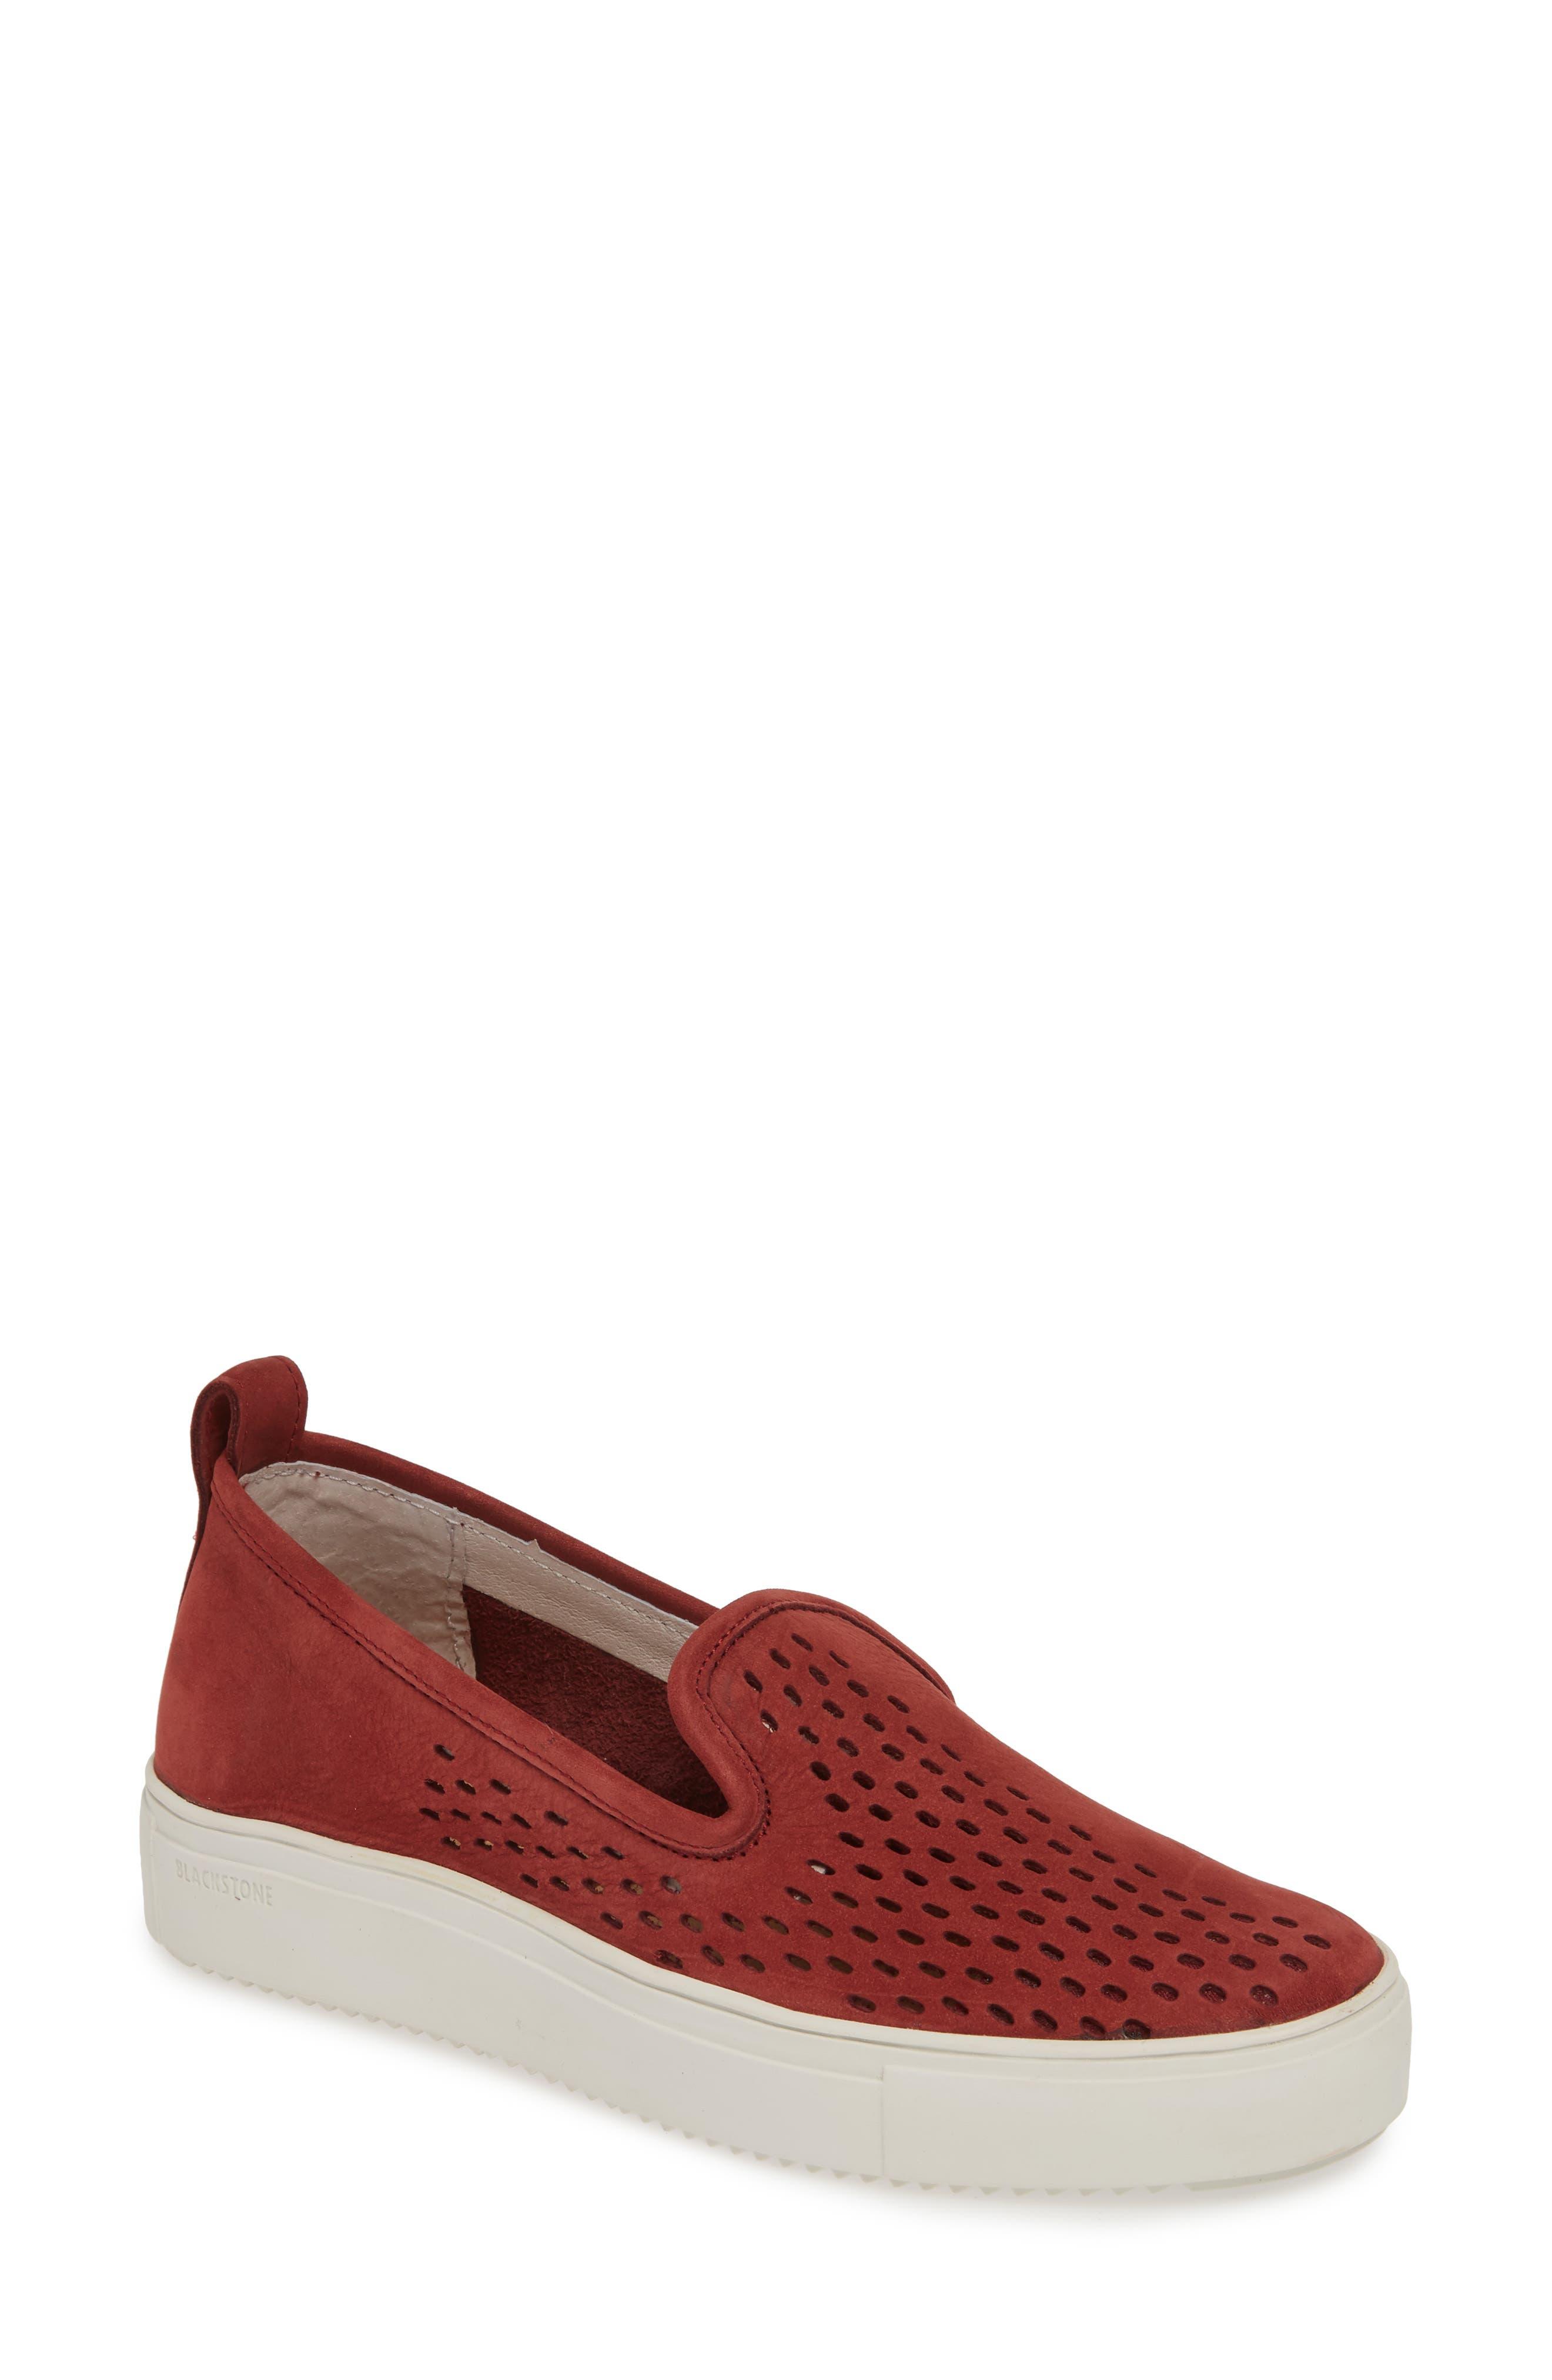 Blackstone Rl68 Perforated Slip-On Sneaker, Burgundy